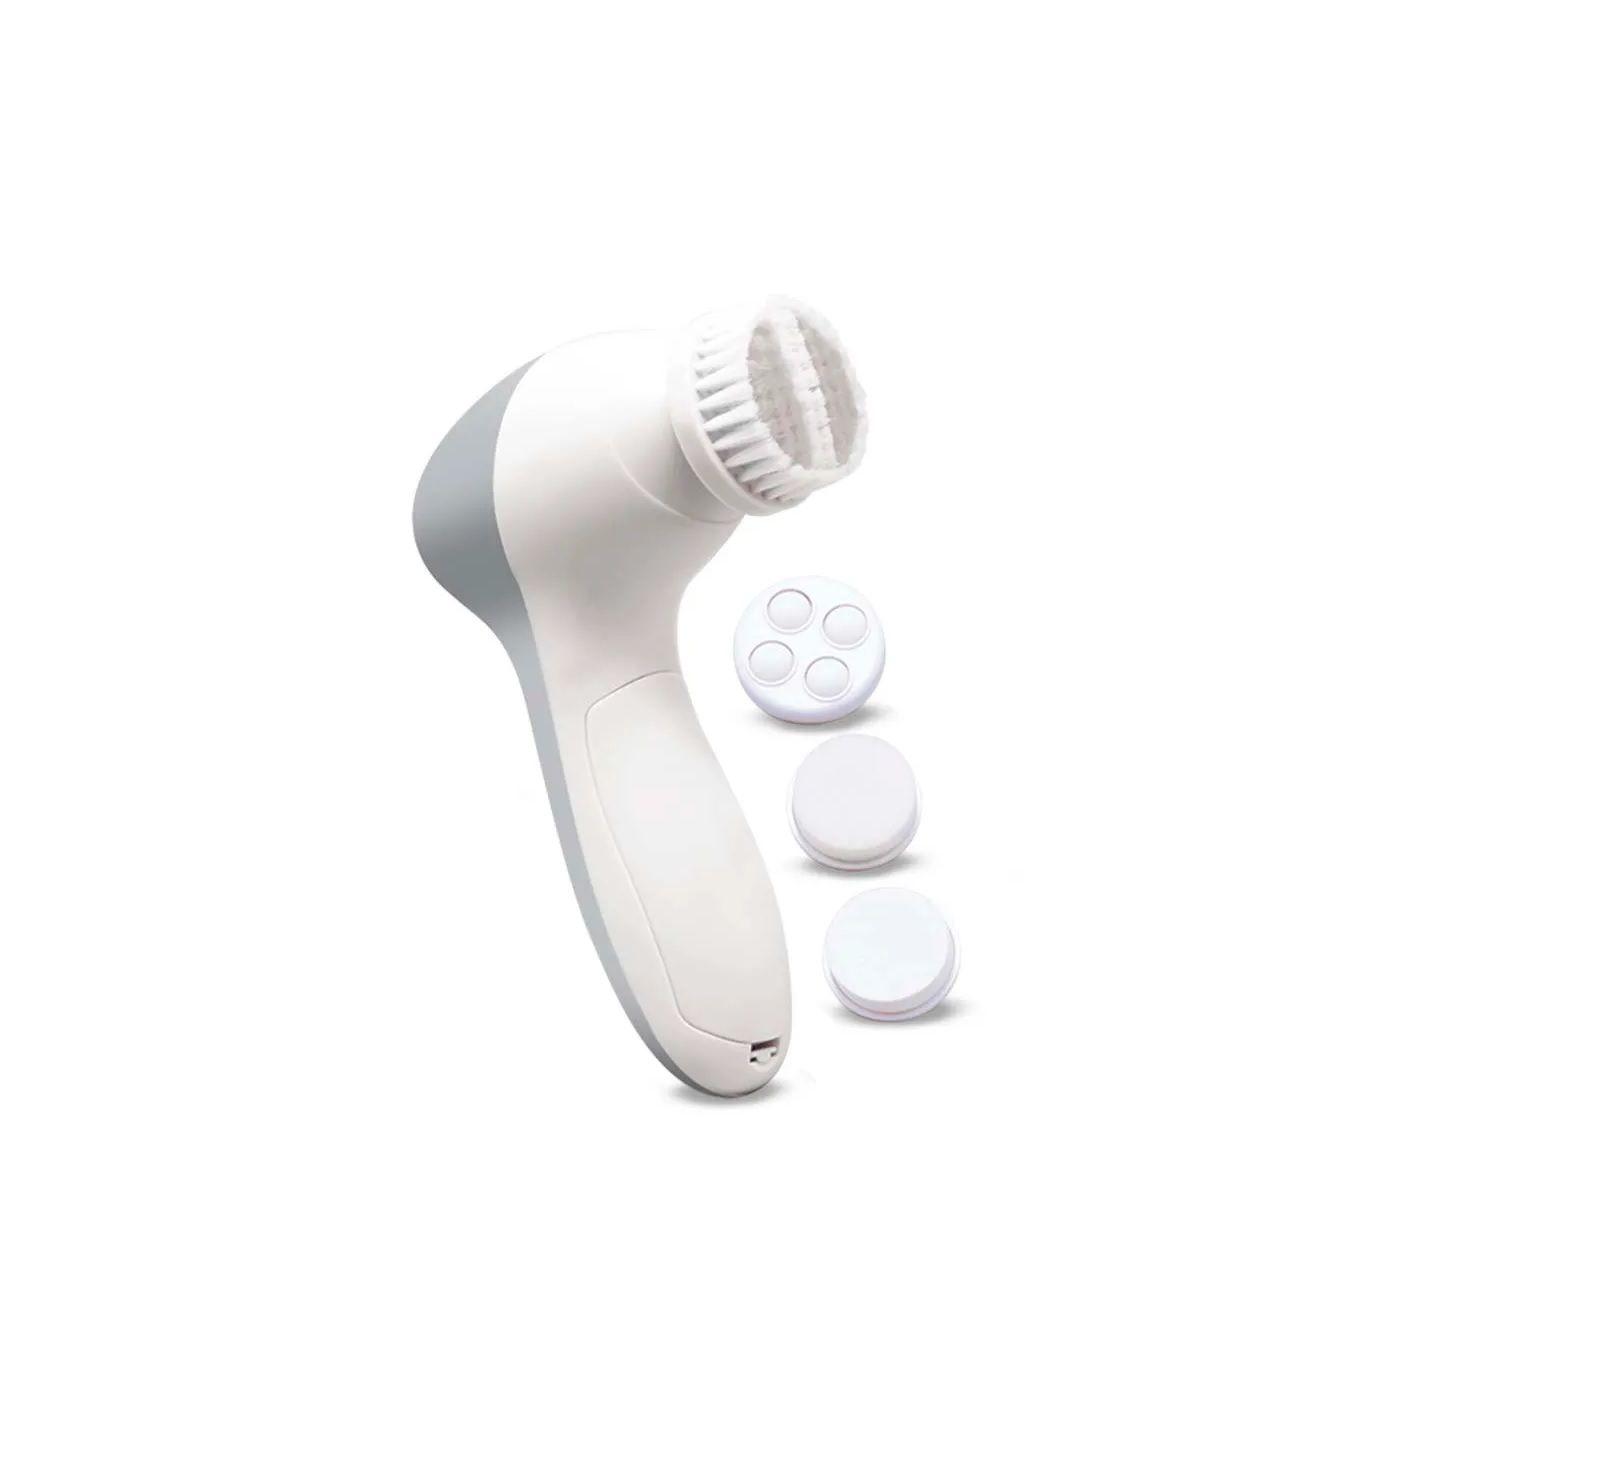 Kit Spa Facial 4 em 1 2 velocidades Multilaser Cinza - HC184  - Mix Eletro